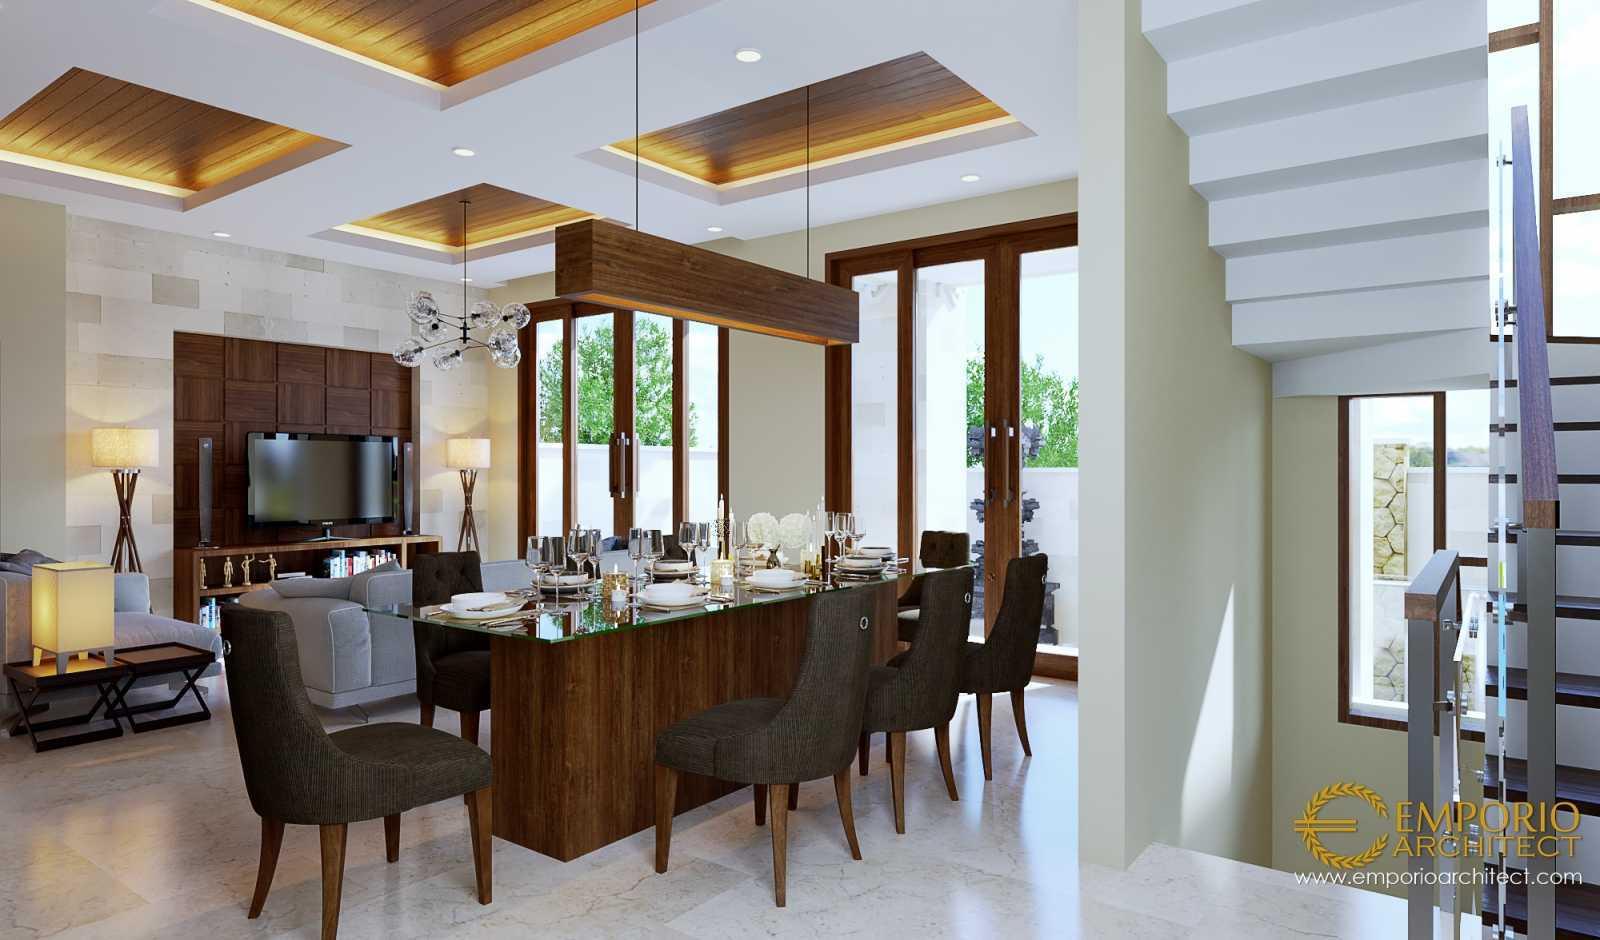 Emporio Architect Desain Rumah Villa Bali Tropis 494 @ Denpasar, Bali Kota Denpasar, Bali, Indonesia Kota Denpasar, Bali, Indonesia Emporio-Architect-Desain-Rumah-Villa-Bali-Tropis-494-Denpasar-Bali   78281